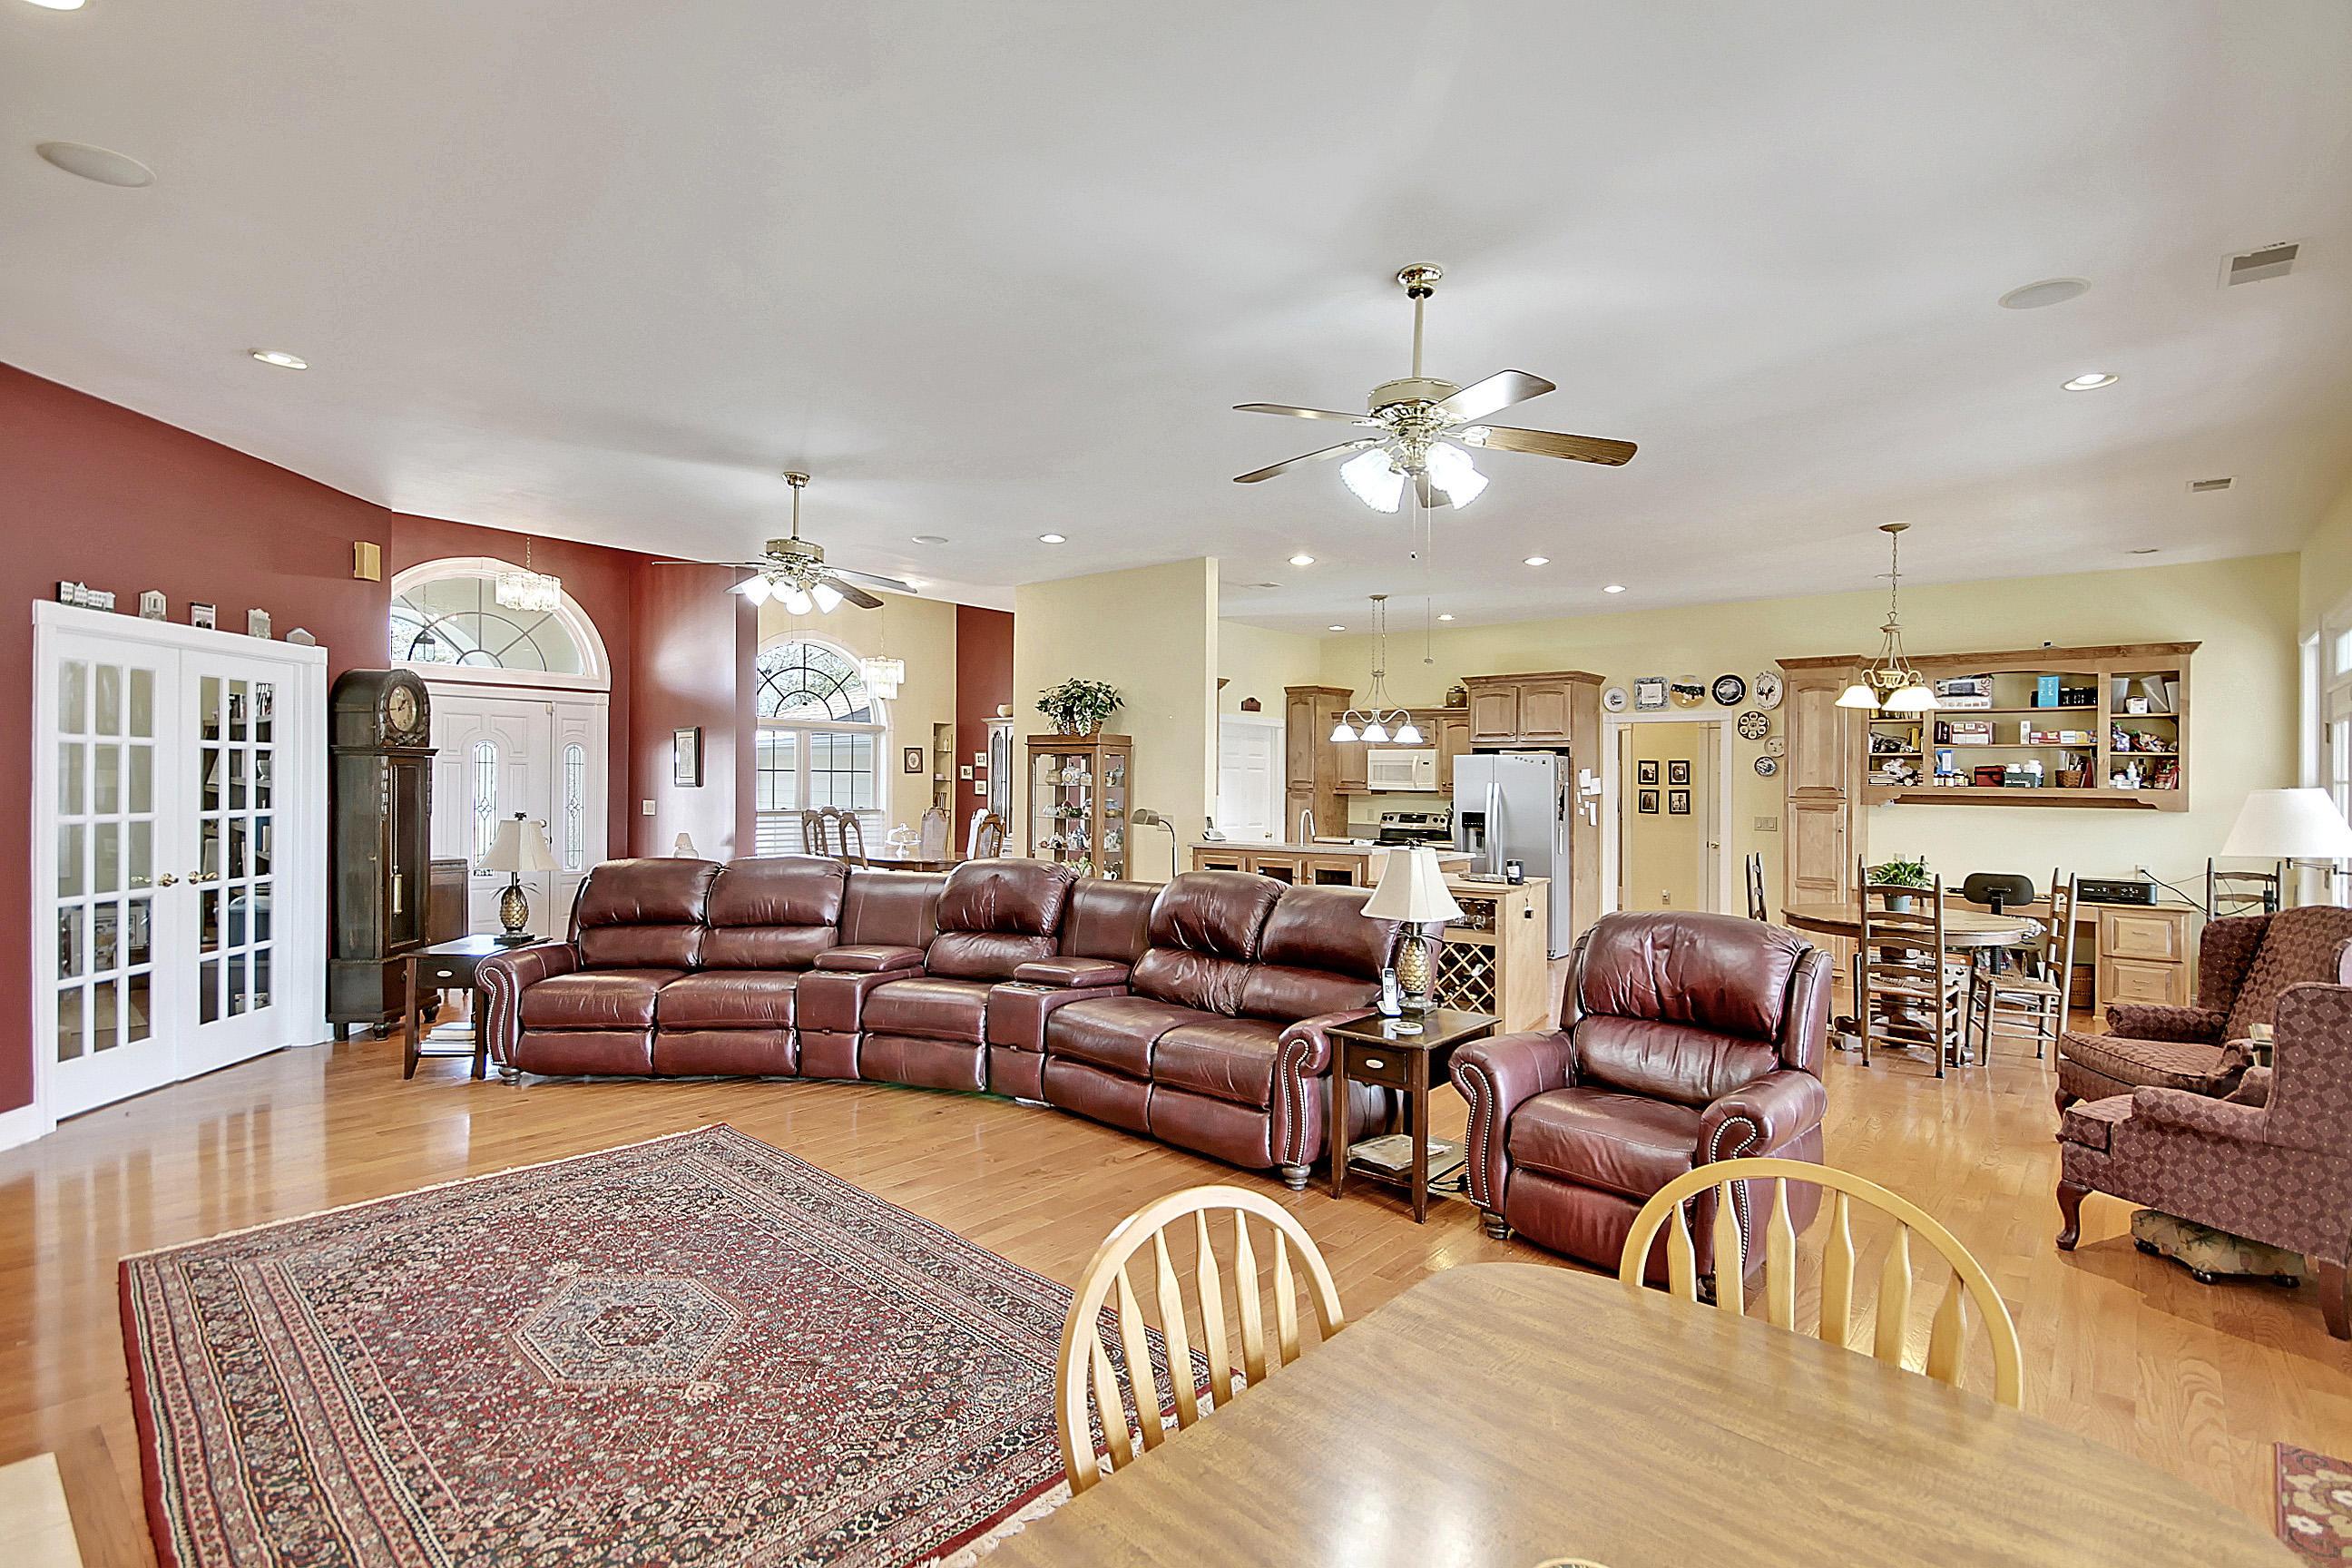 Cross Subd (Longpoint) Homes For Sale - 1191 Longpoint, Cross, SC - 17